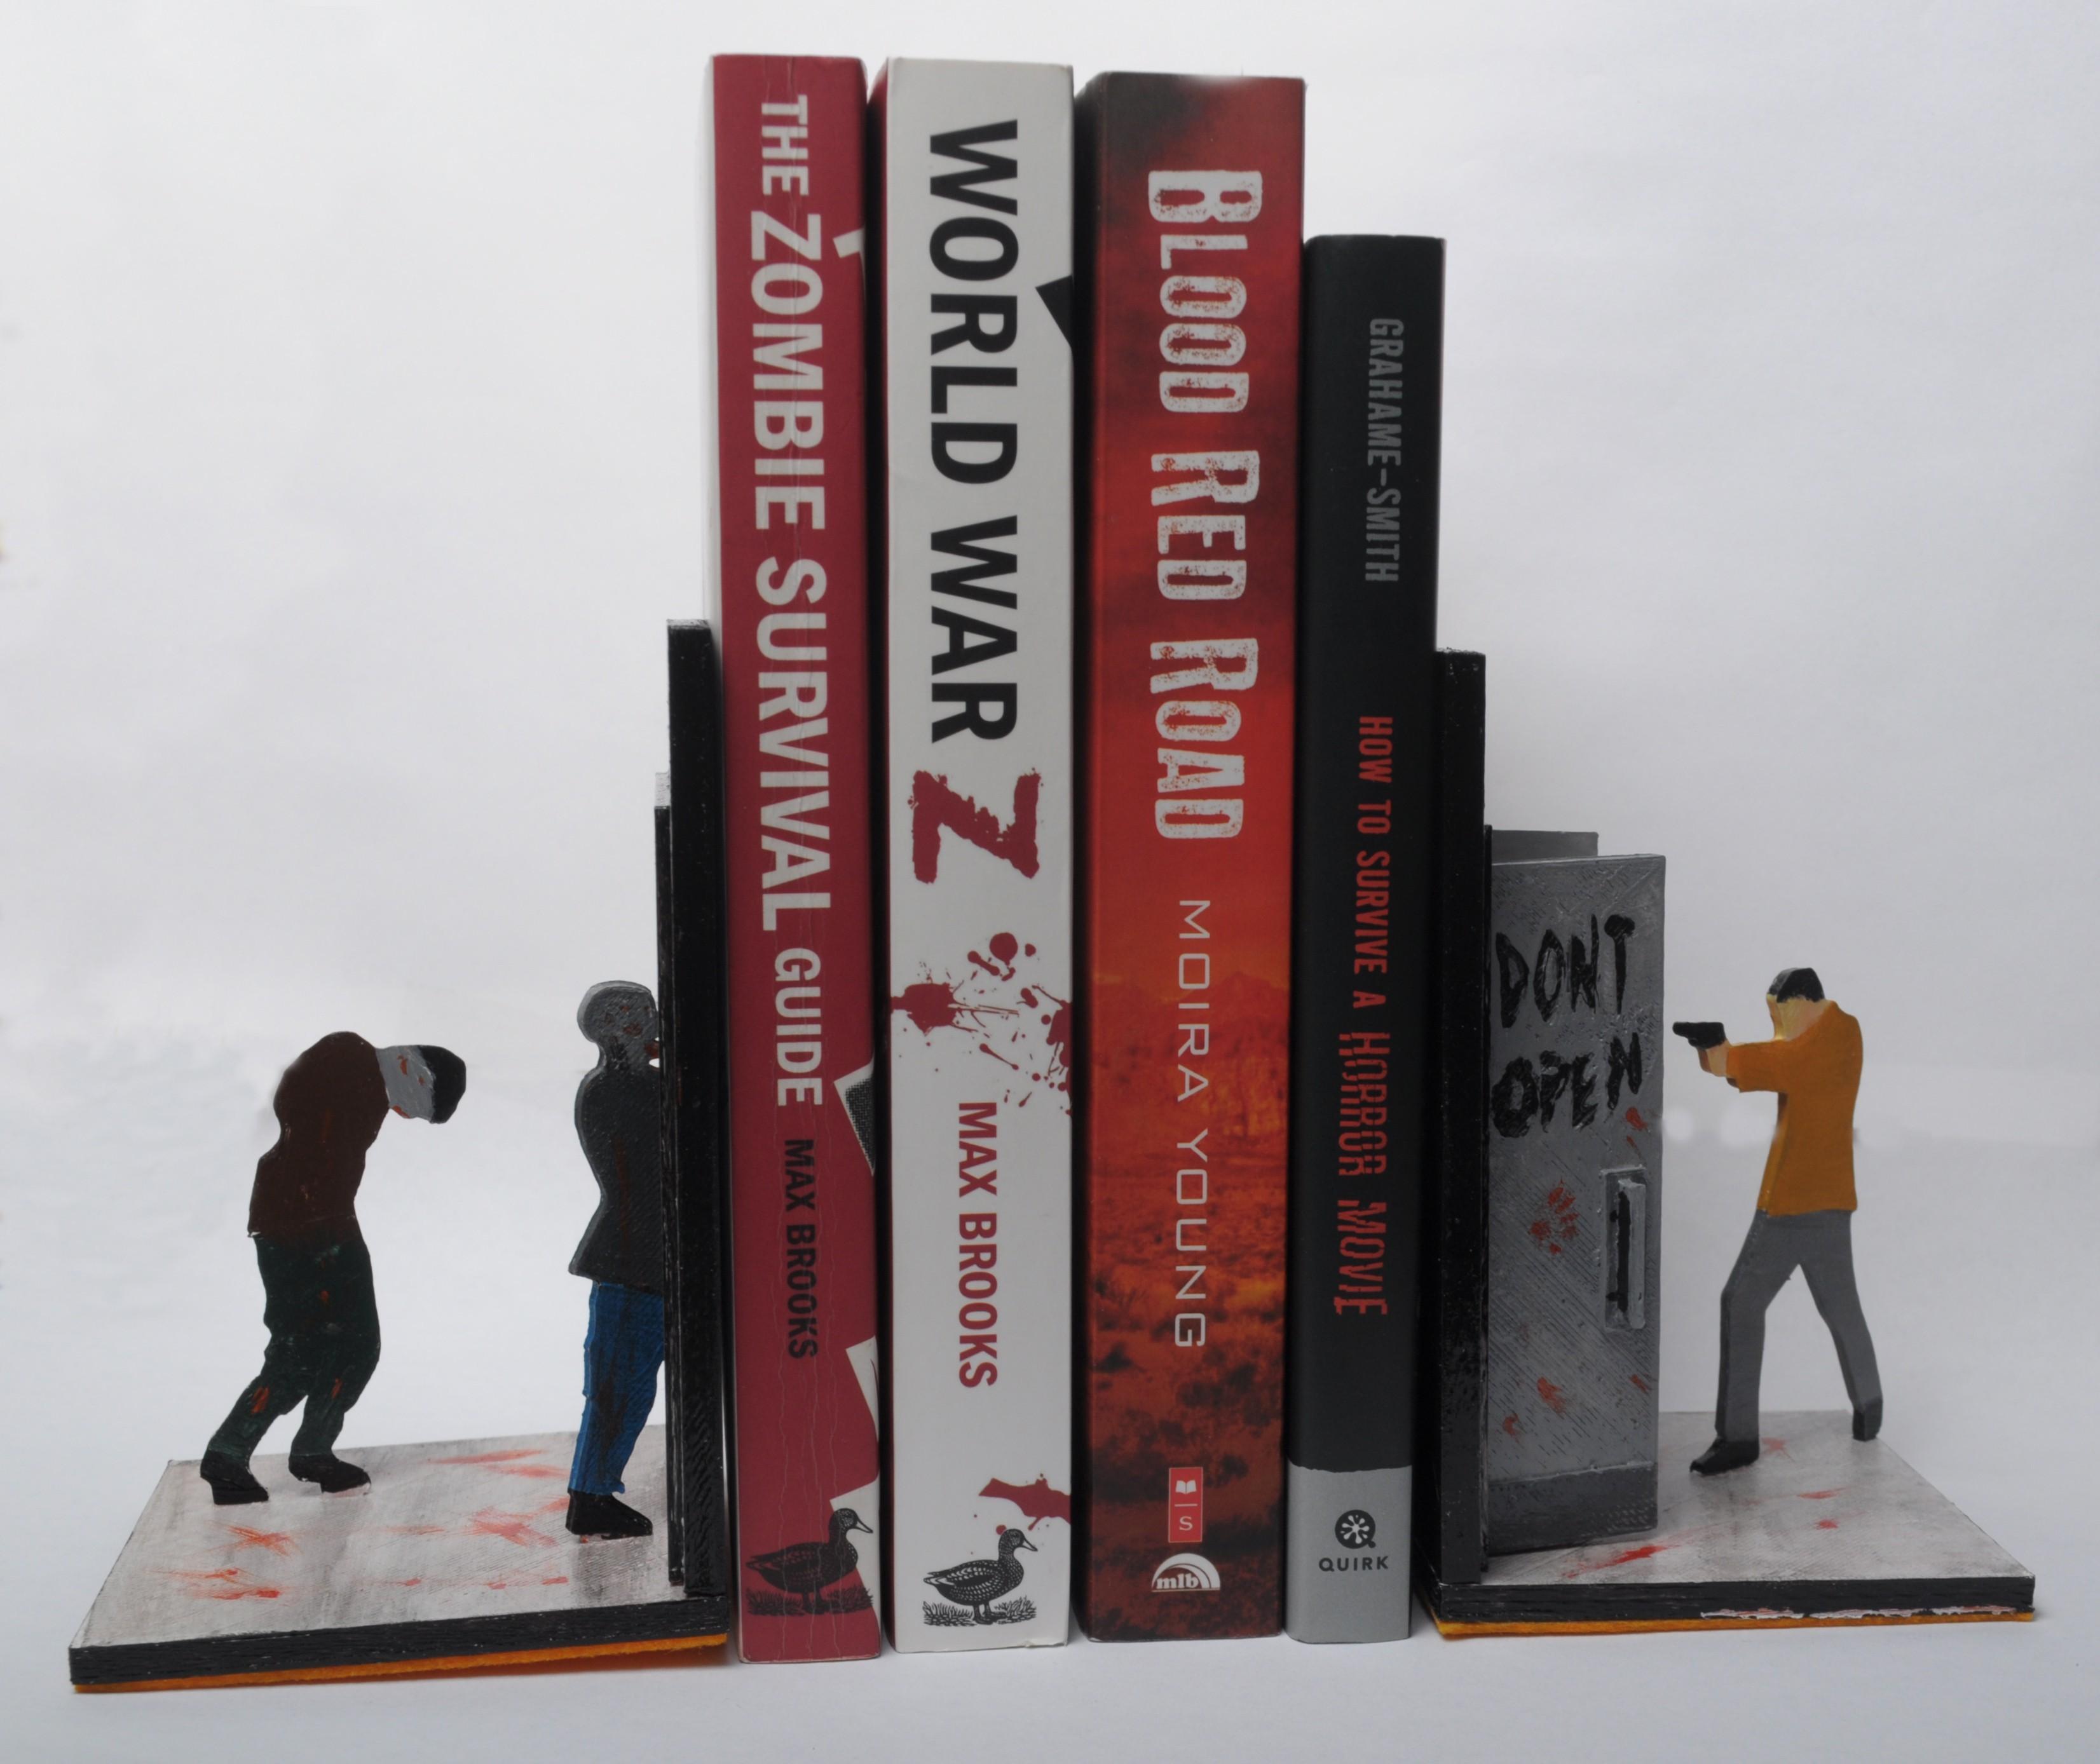 DSC_3777.JPG Download free STL file Walking Dead Book Ends • 3D printable design, wjordan819